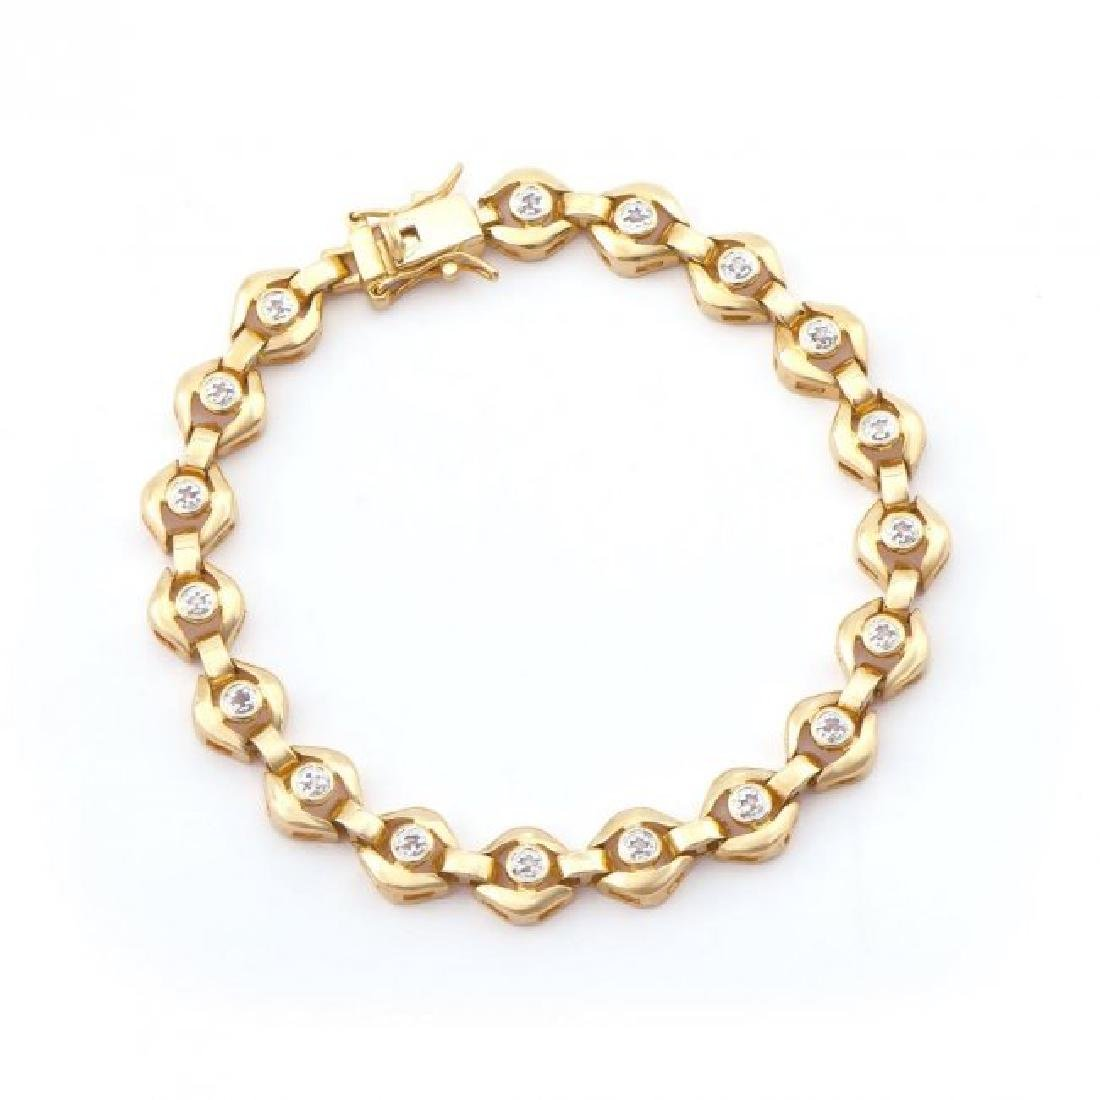 0.69 CT Diamond Designer Bracelet List Price $1,140.00!